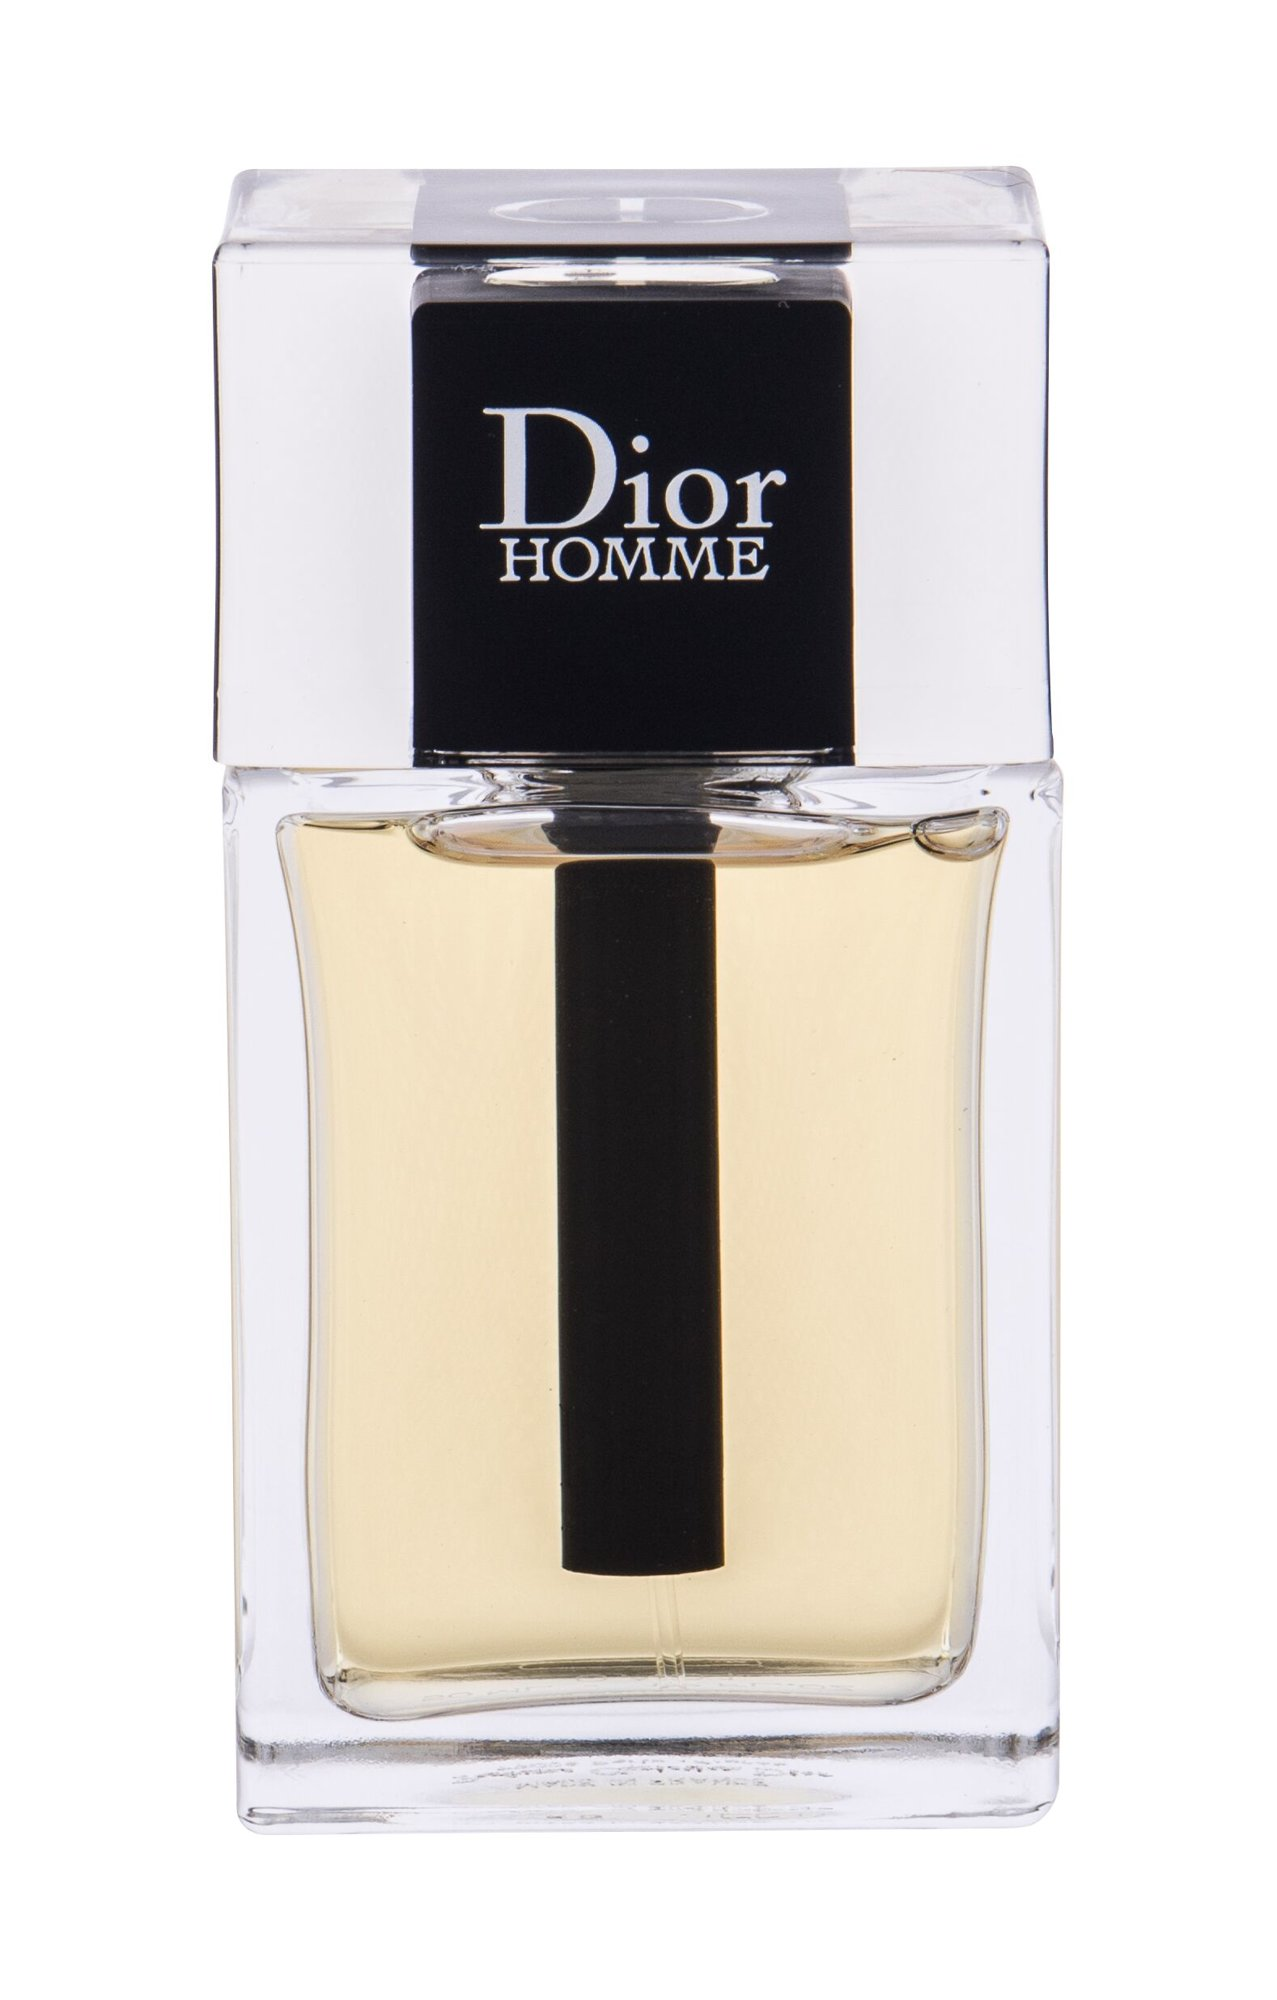 Christian Dior Dior Homme 2020, Toaletná voda 50ml